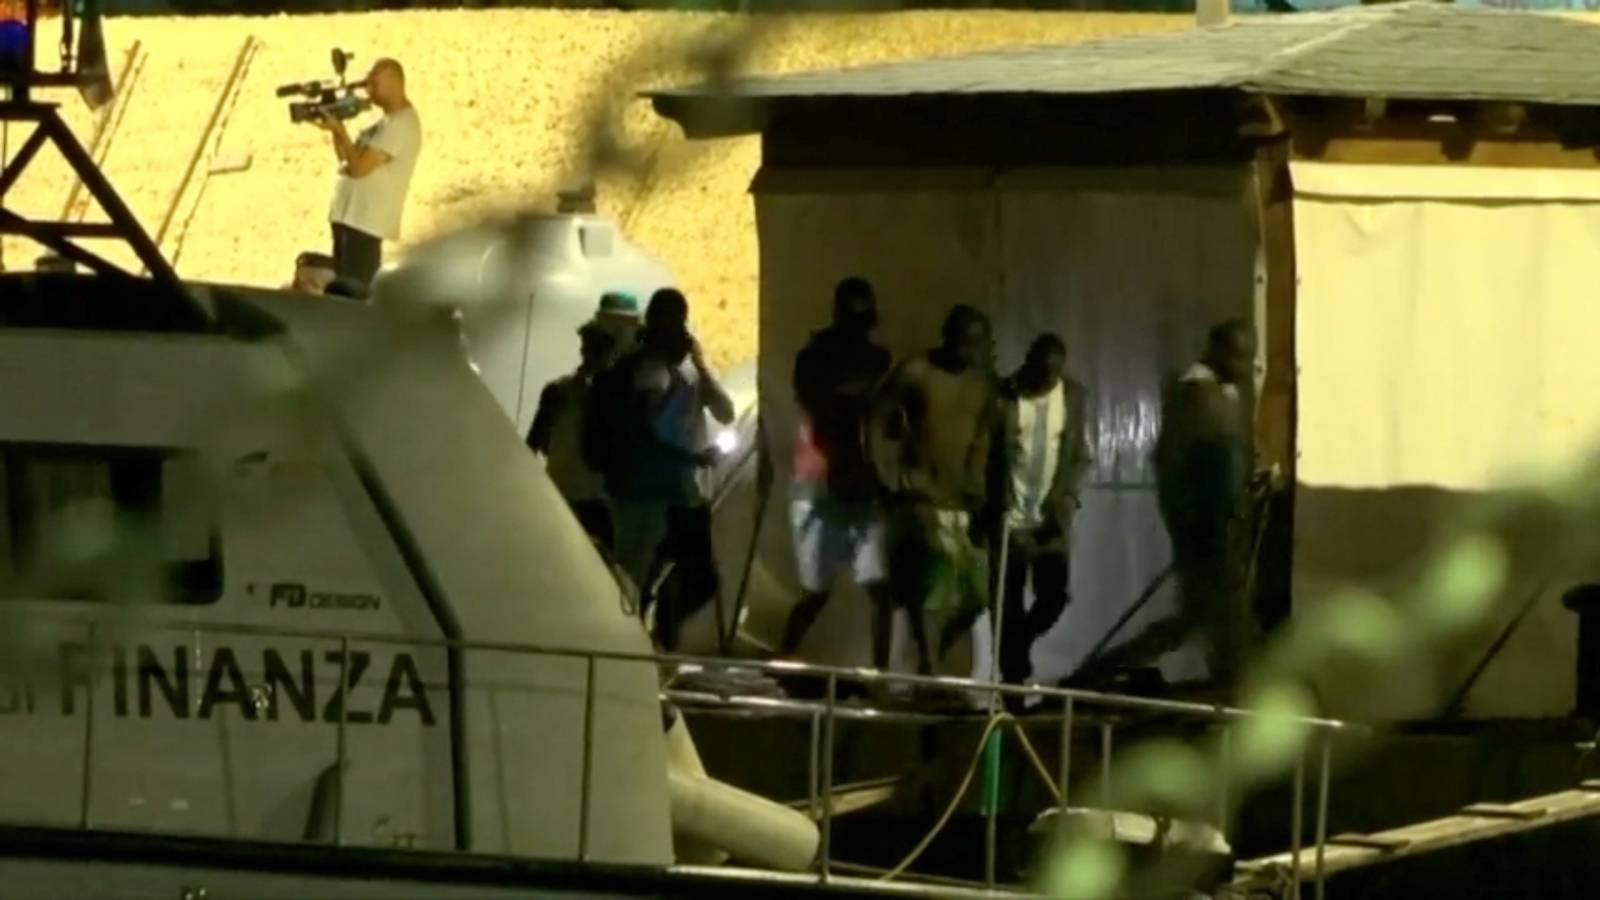 Migrants disembark a rescue boat in the port of Lampedusa